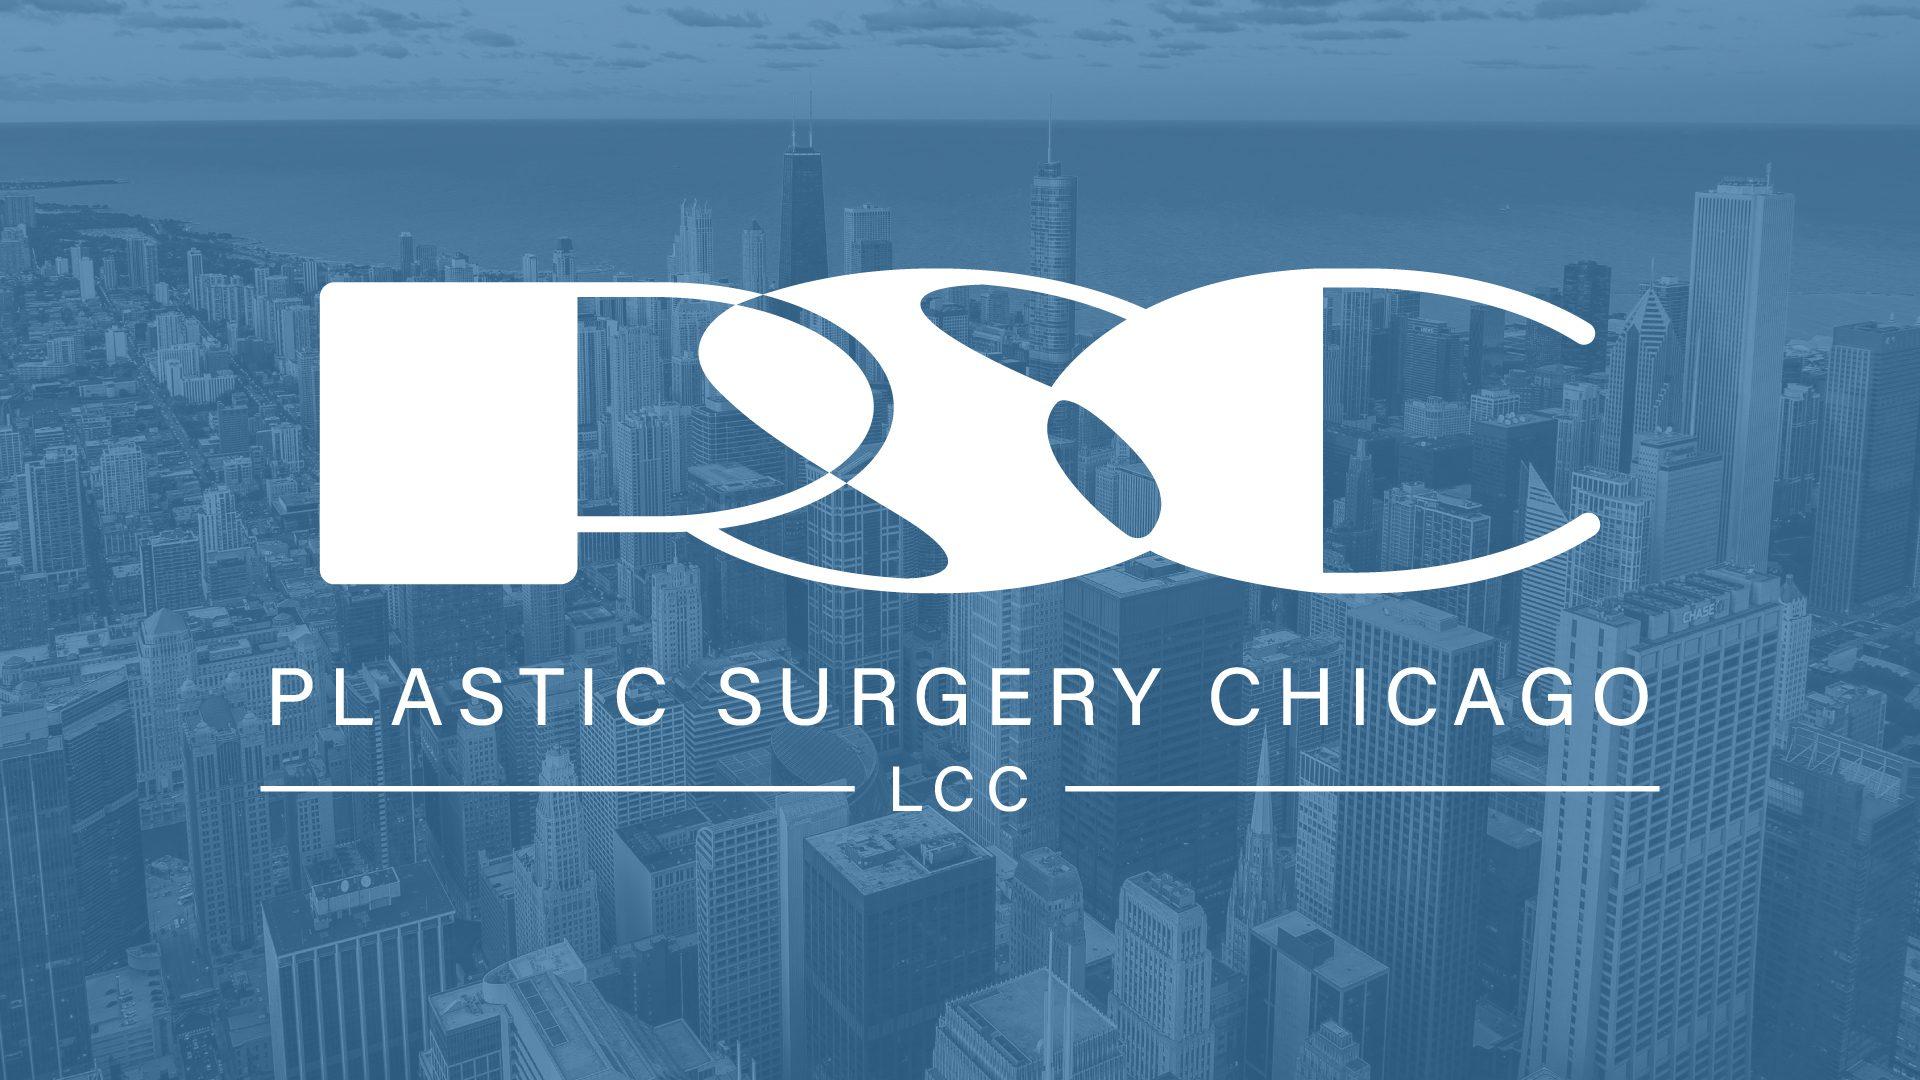 Cocaine Nose Chicago, IL - Chicago Plastic Surgery, LLC